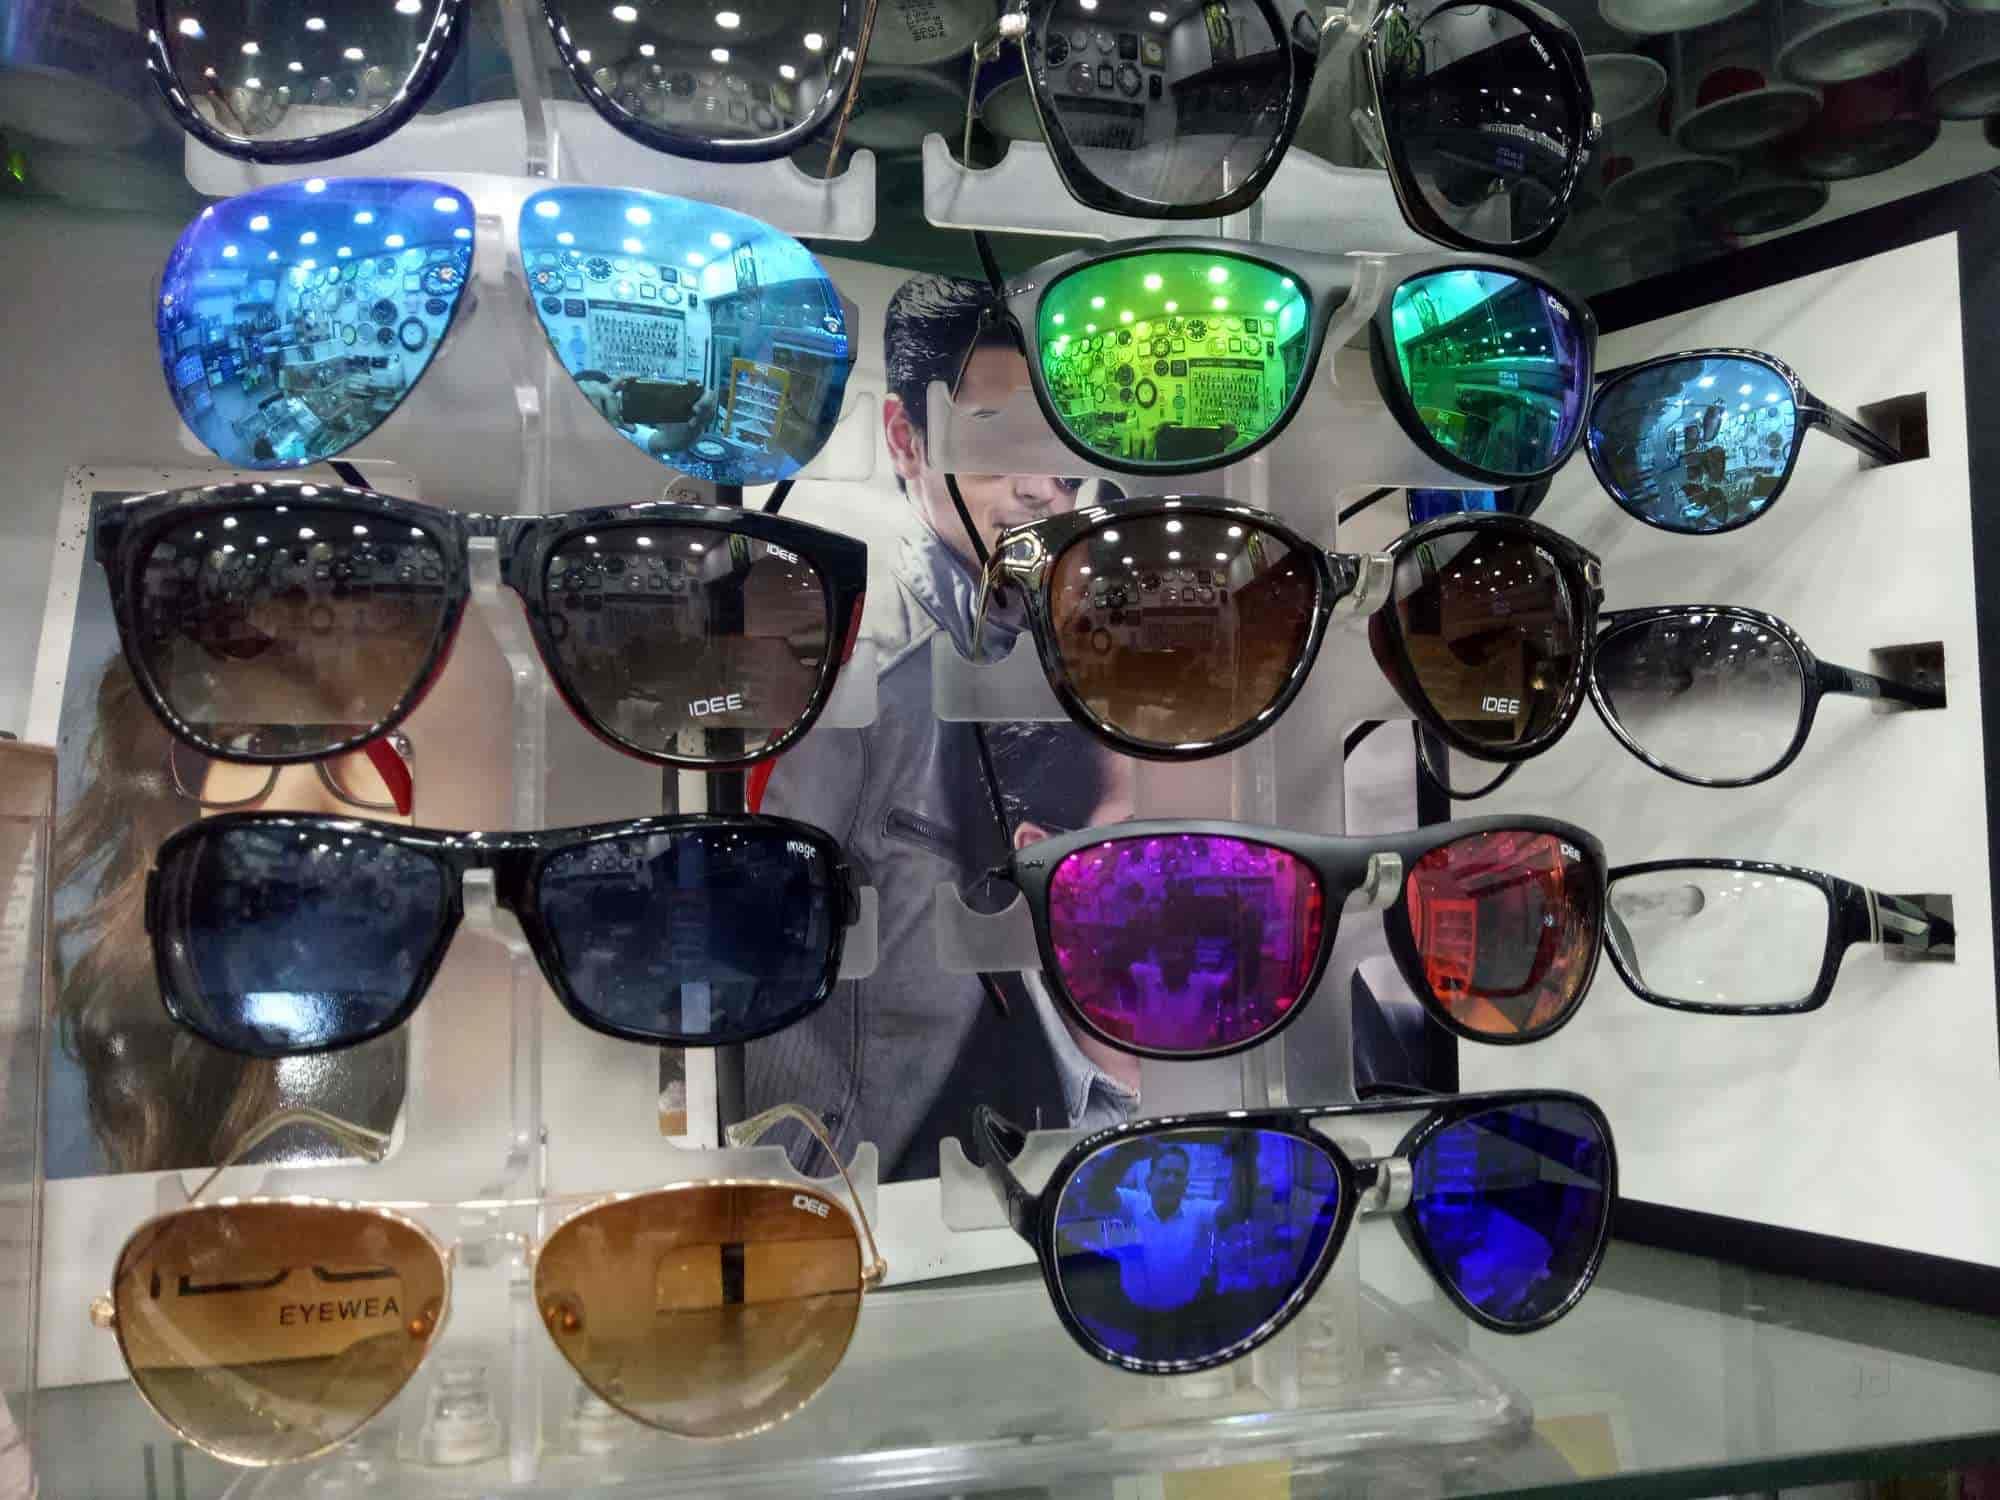 bddad224d4f Fashion Mart, Near Narayna E Techno School - Wrist Watch Dealers in ...